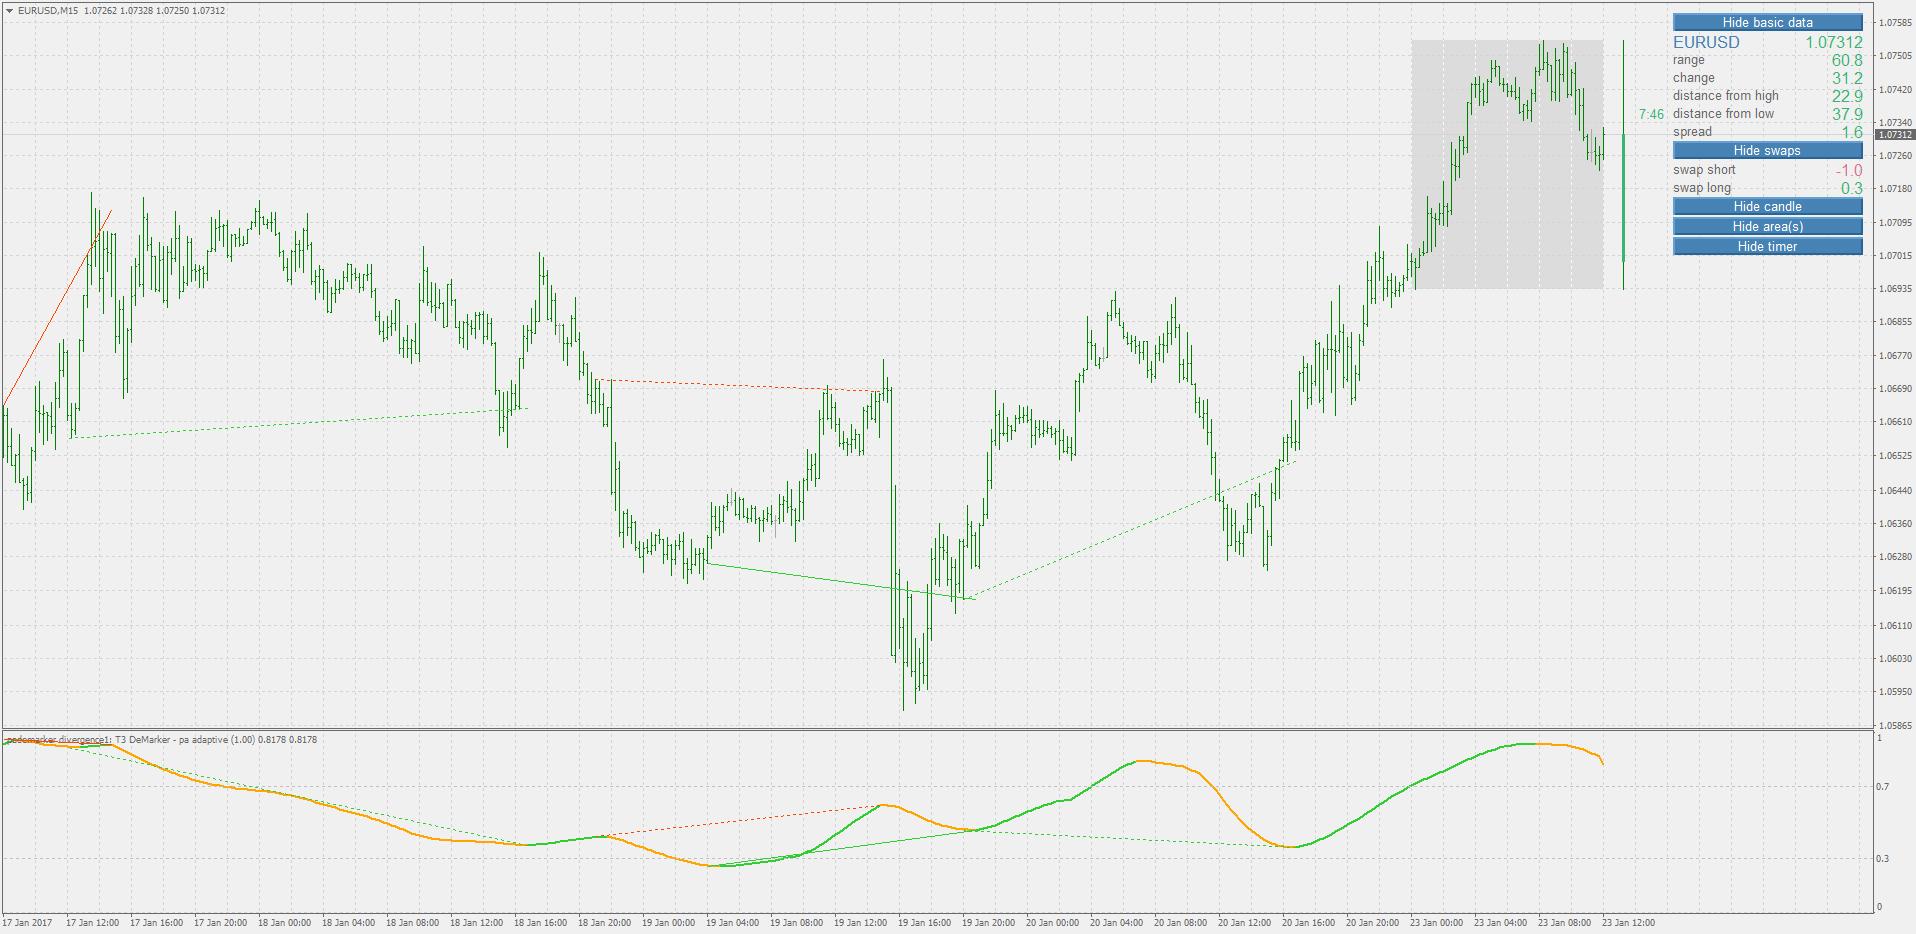 Multi Timeframe Indicators - Price Chart - Technical